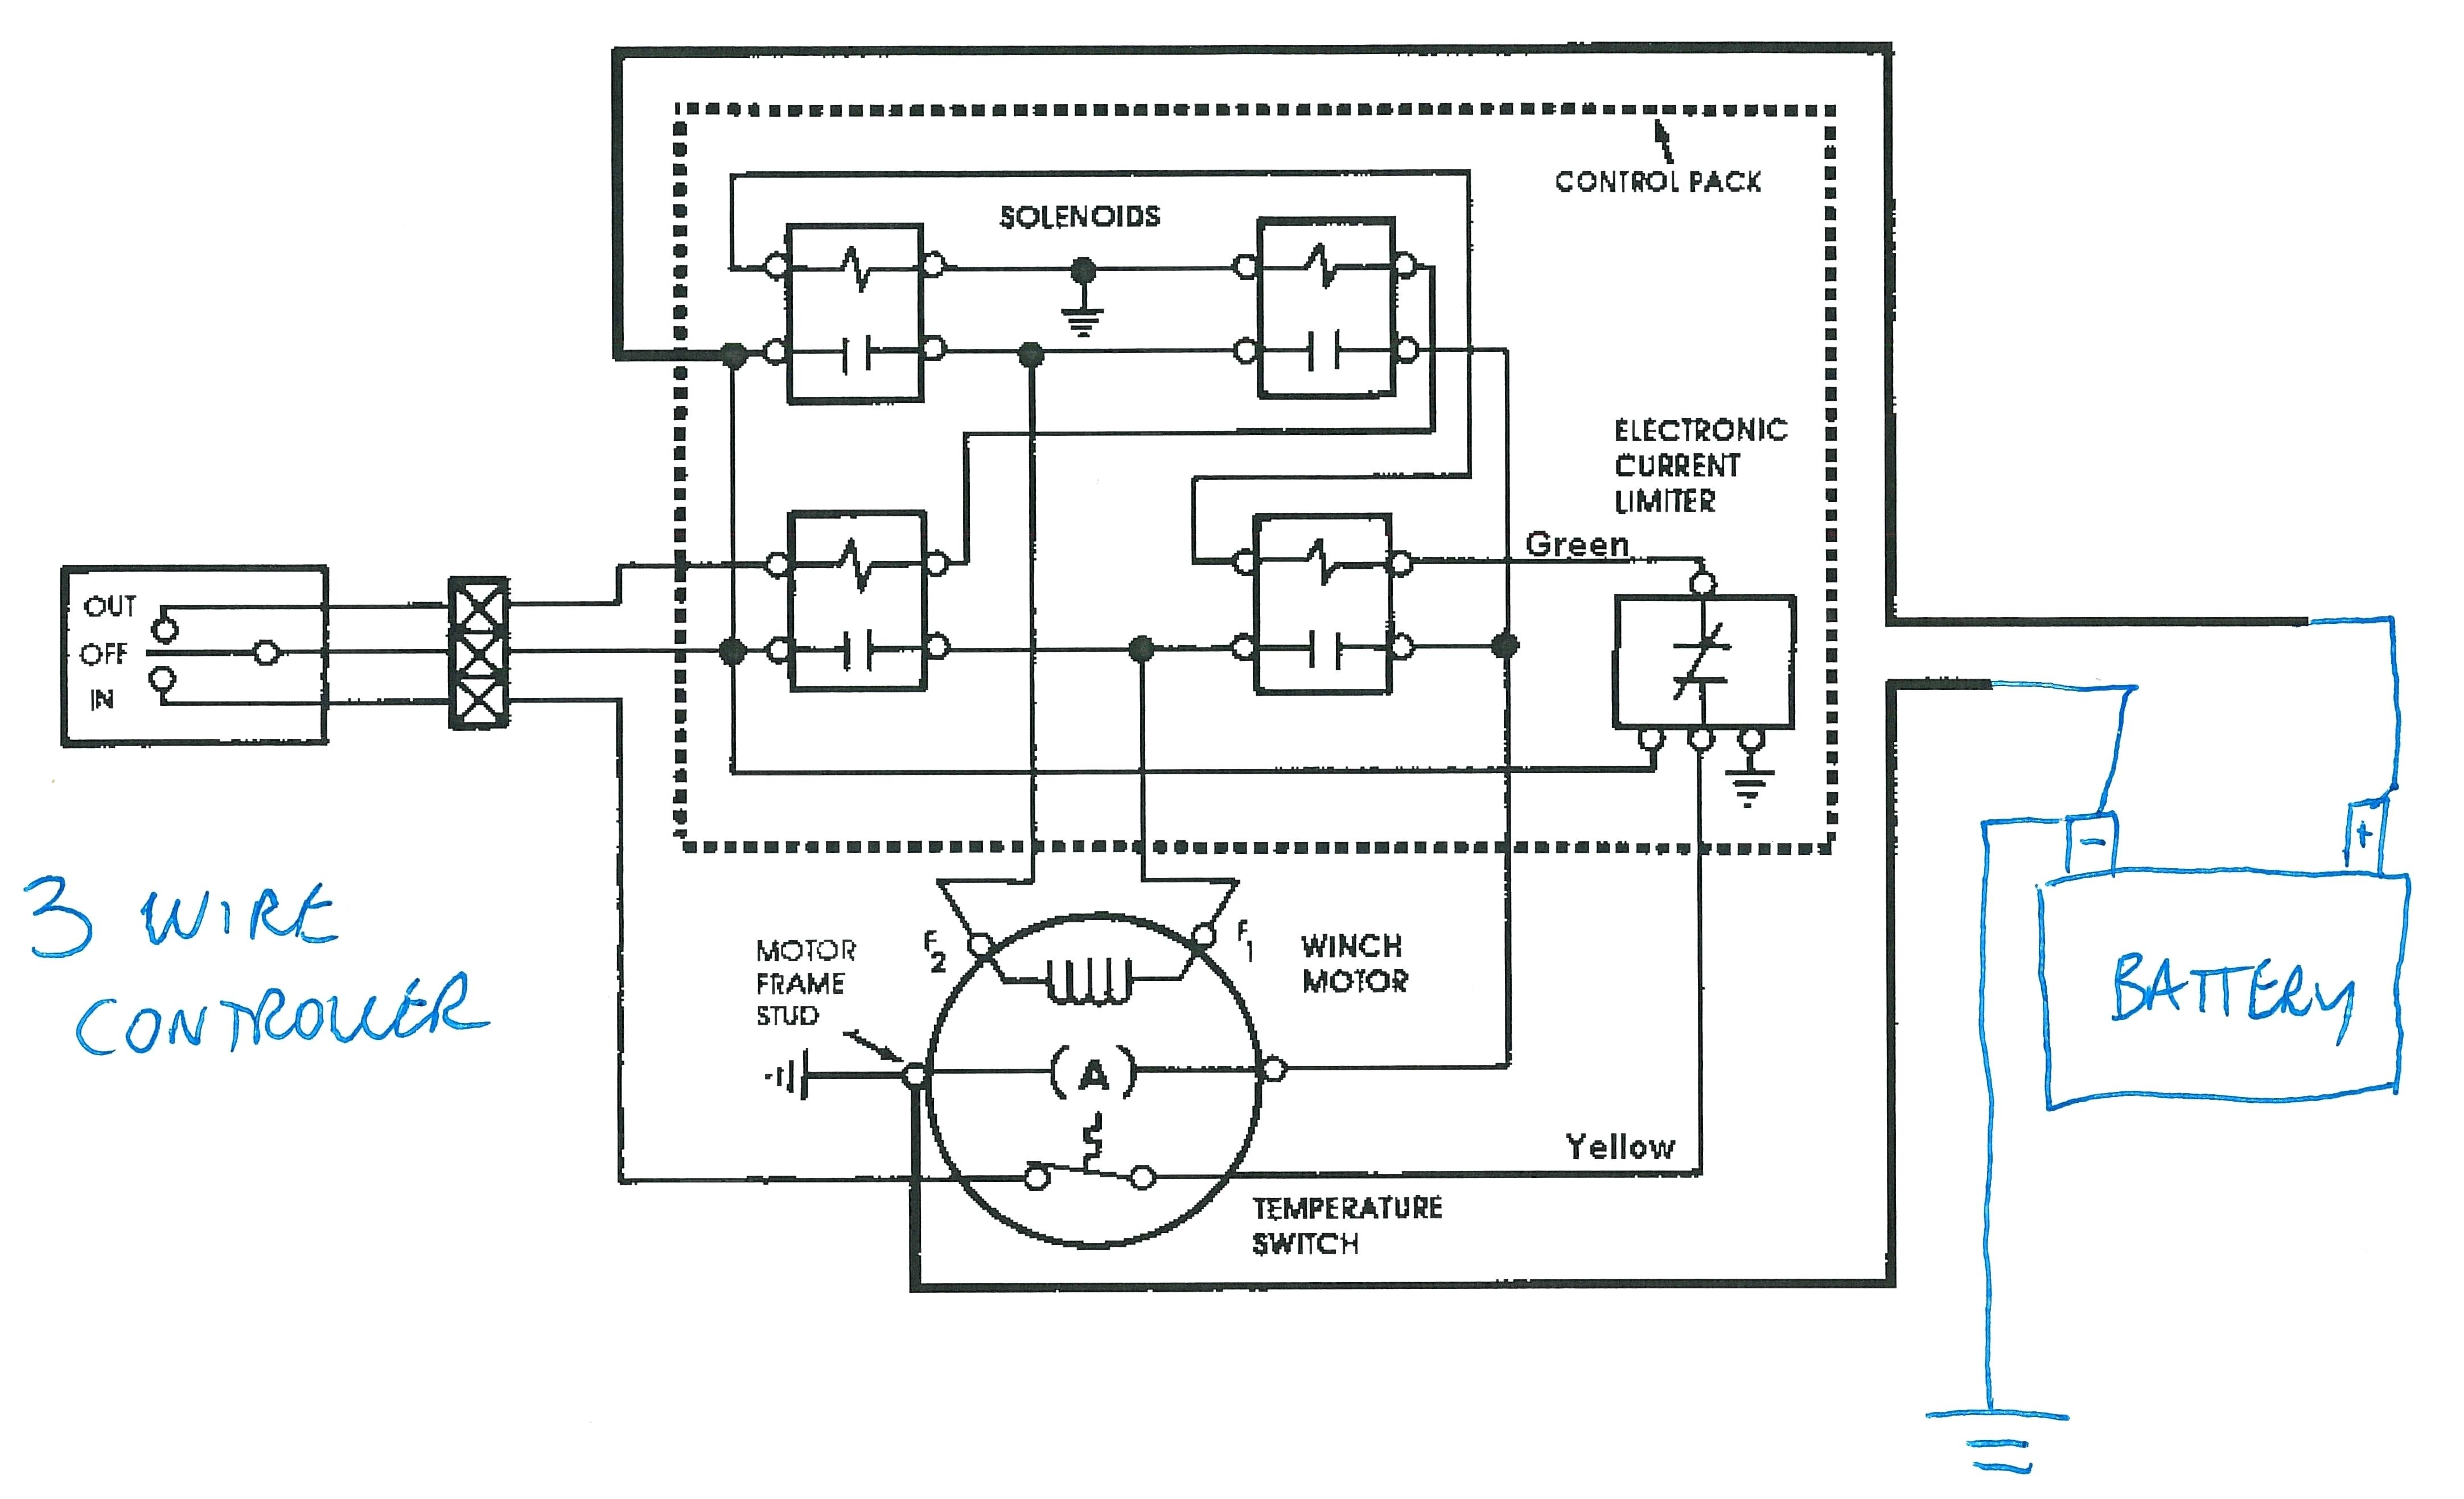 Xd9000 Warn Winch Wiring Diagram | Free Wiring Diagram